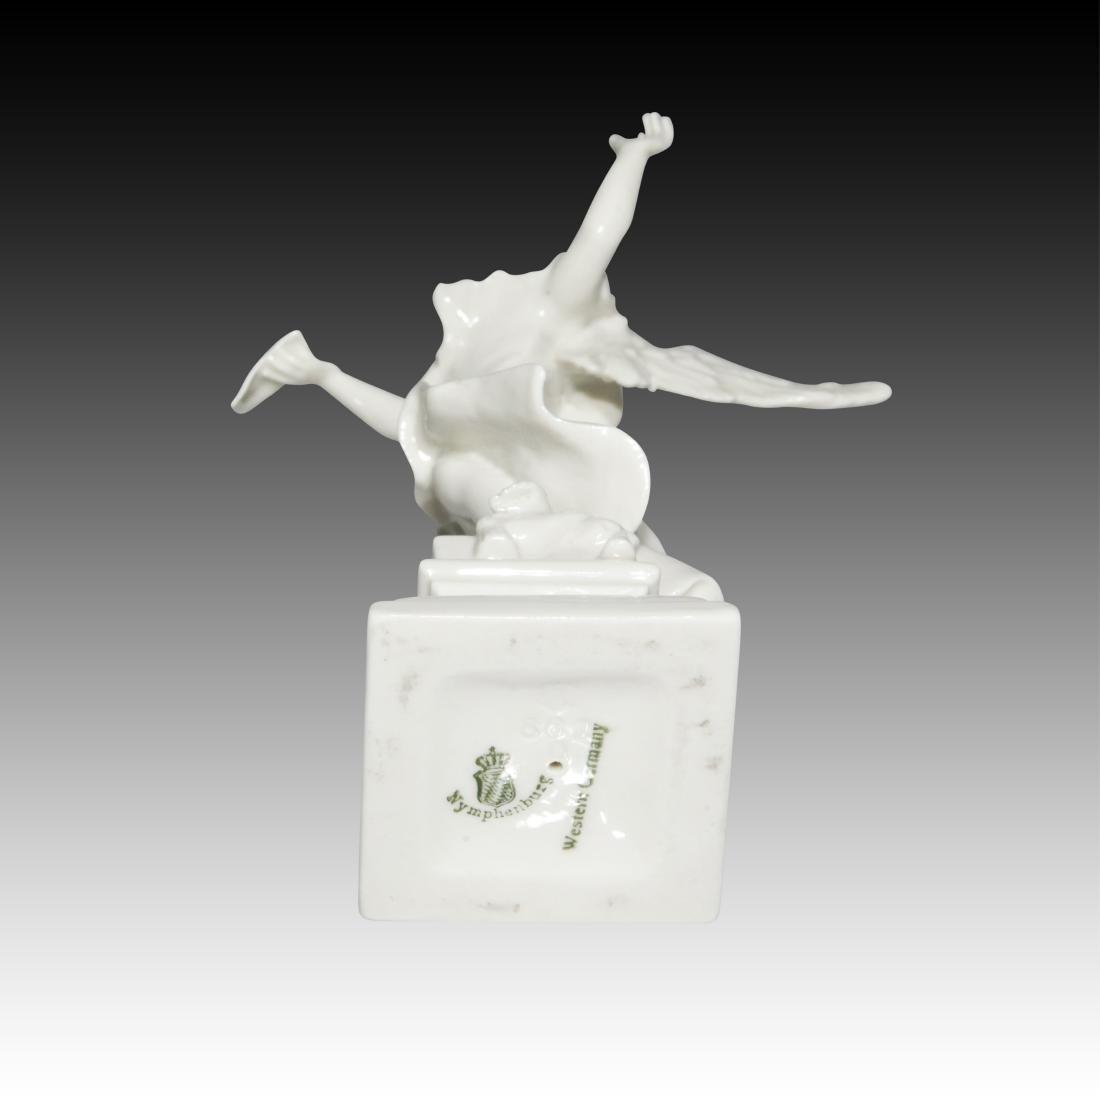 Nymphenburg Blanc de Chine Singing Angel Figurine - 3